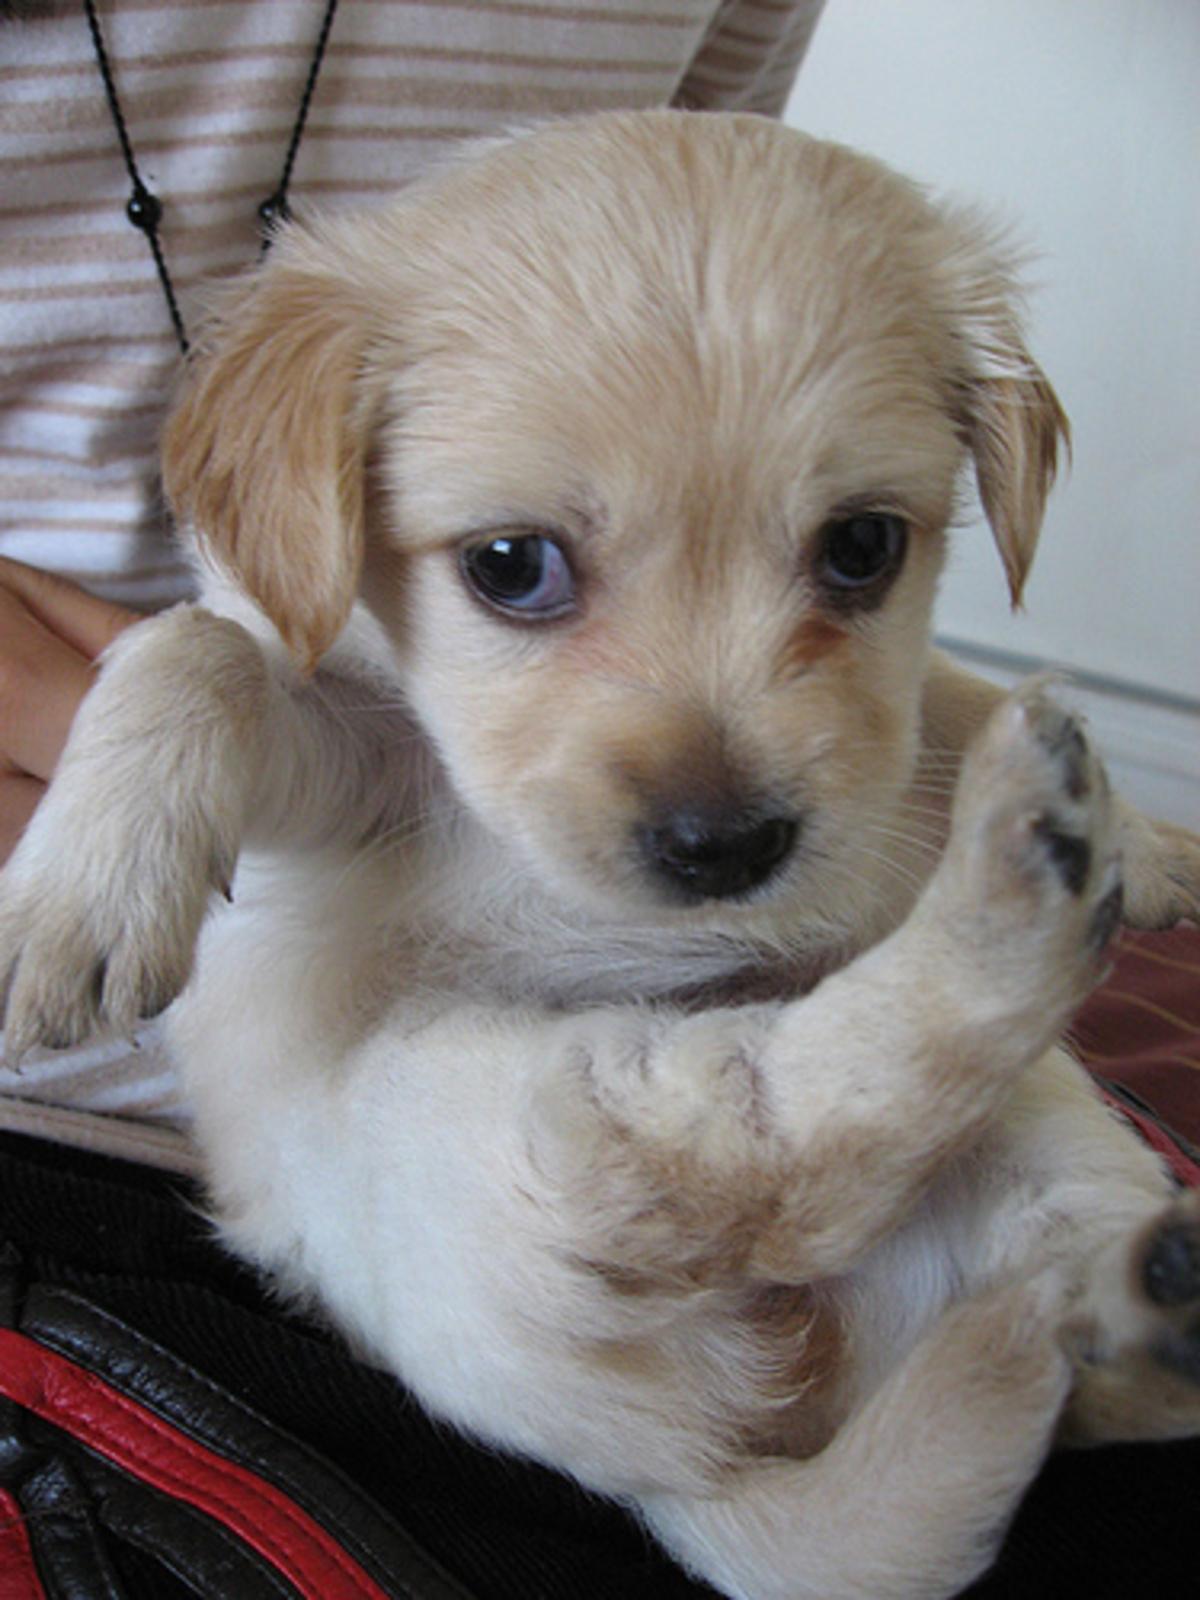 Tα σκυλιά μπορούν να μας «διαβάσουν»… | Newsit.gr